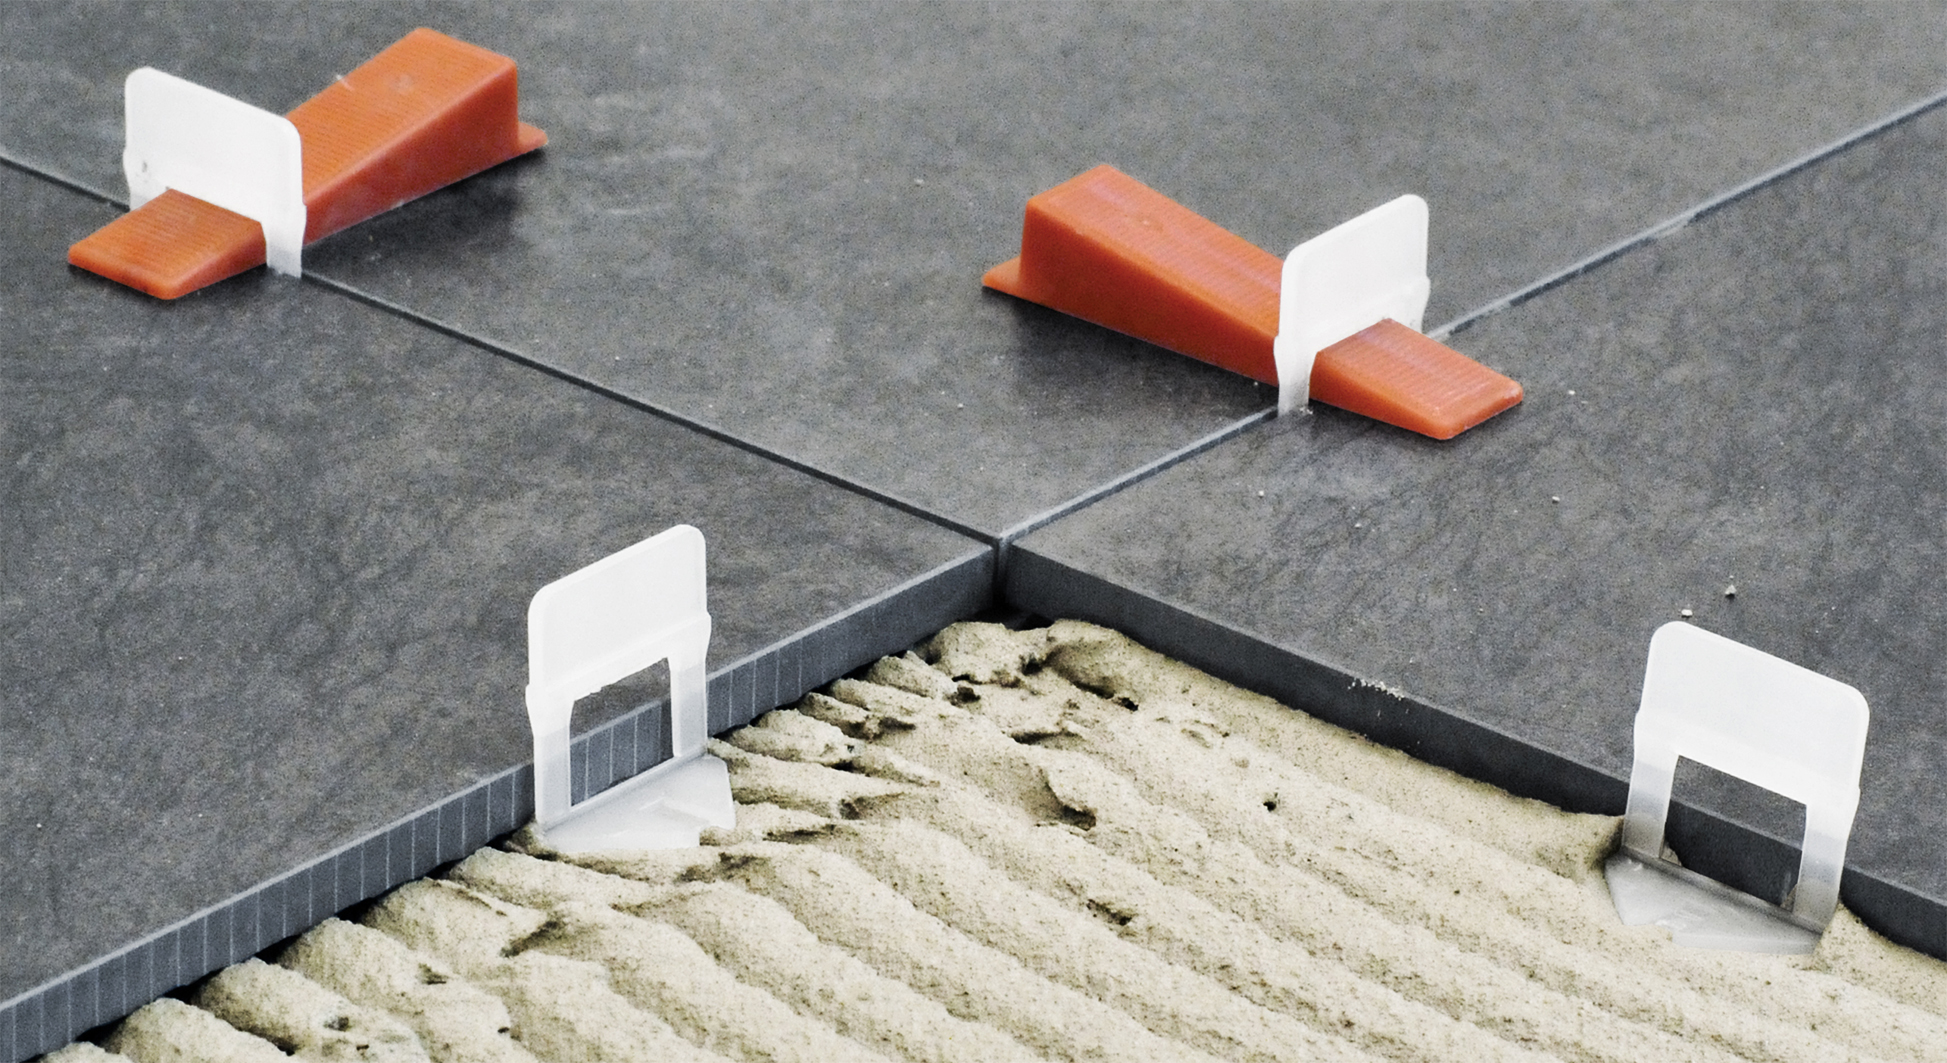 Raimondi S P A Professional Tile Tools Panoramica